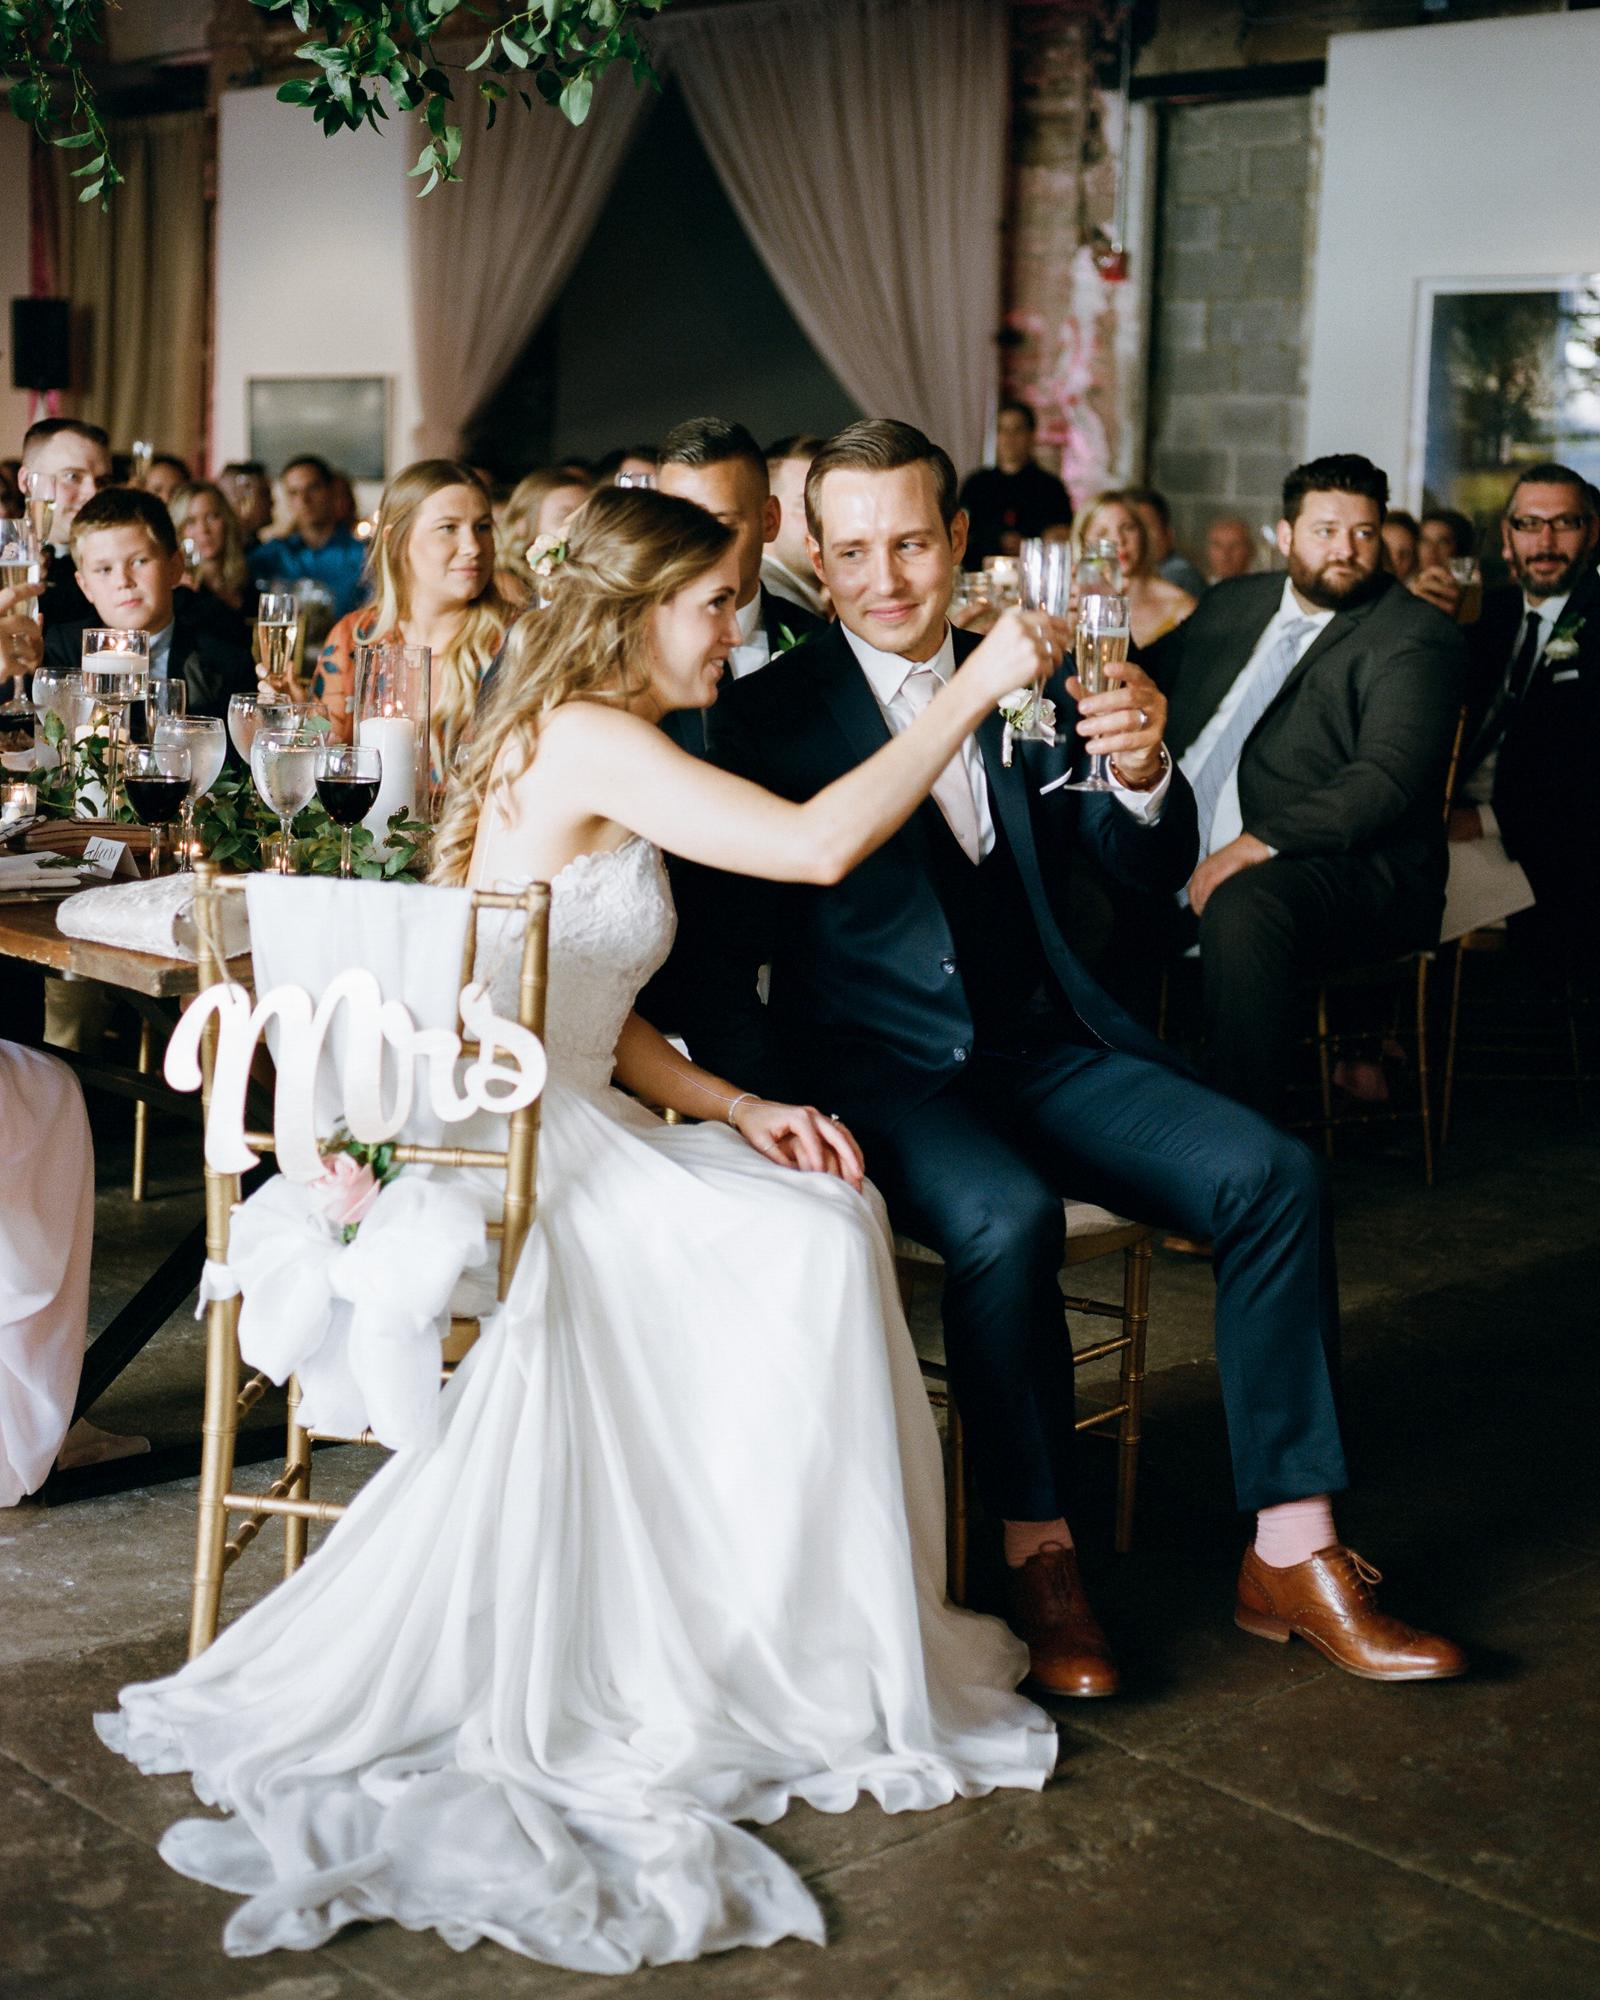 LongView-Gallery-Wedding-Art-Washington-DC-Film-Photographer-51.jpg